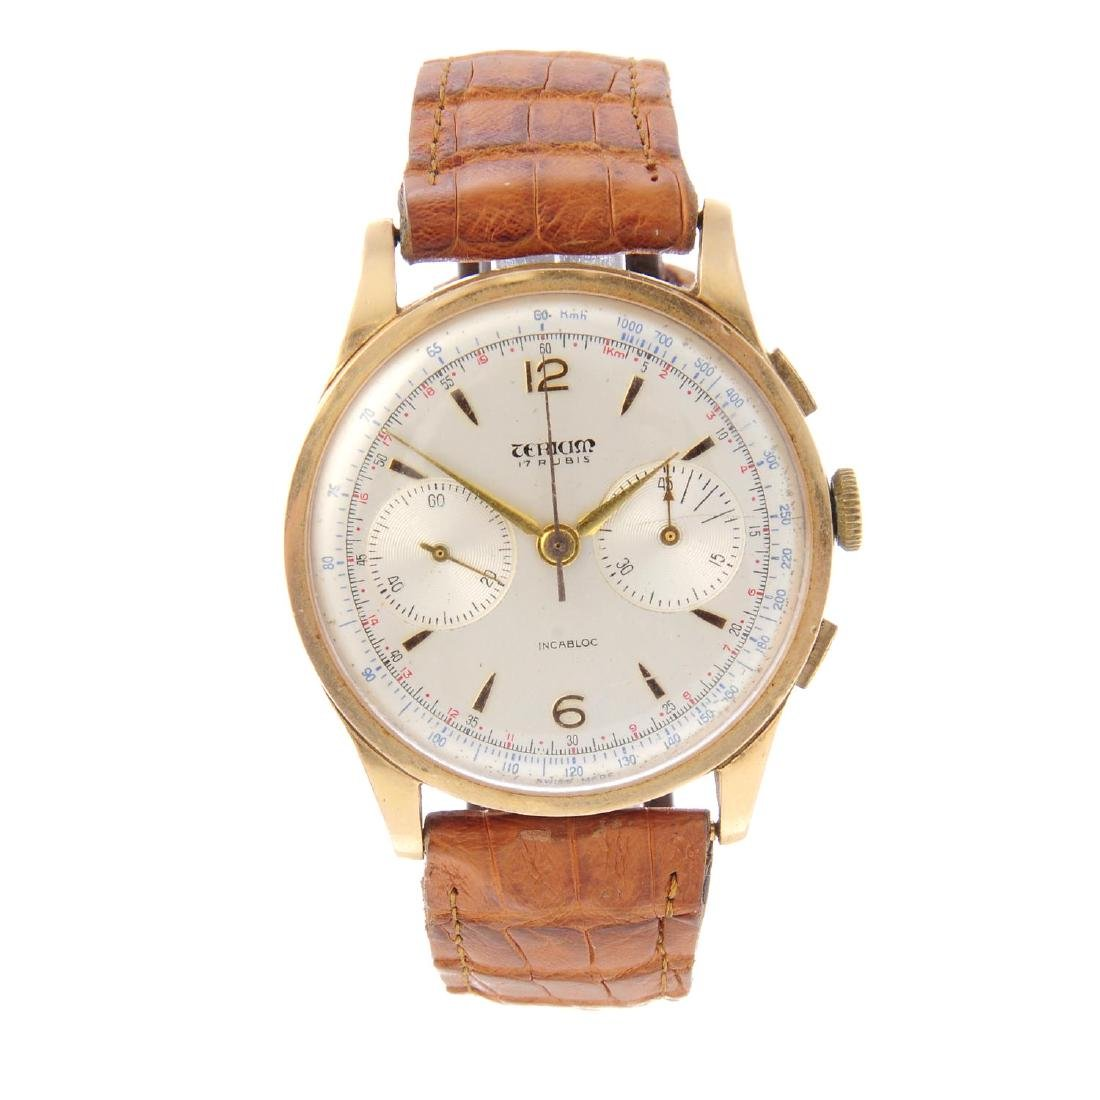 TERIAM - a gentleman's chronograph wrist watch. Yellow